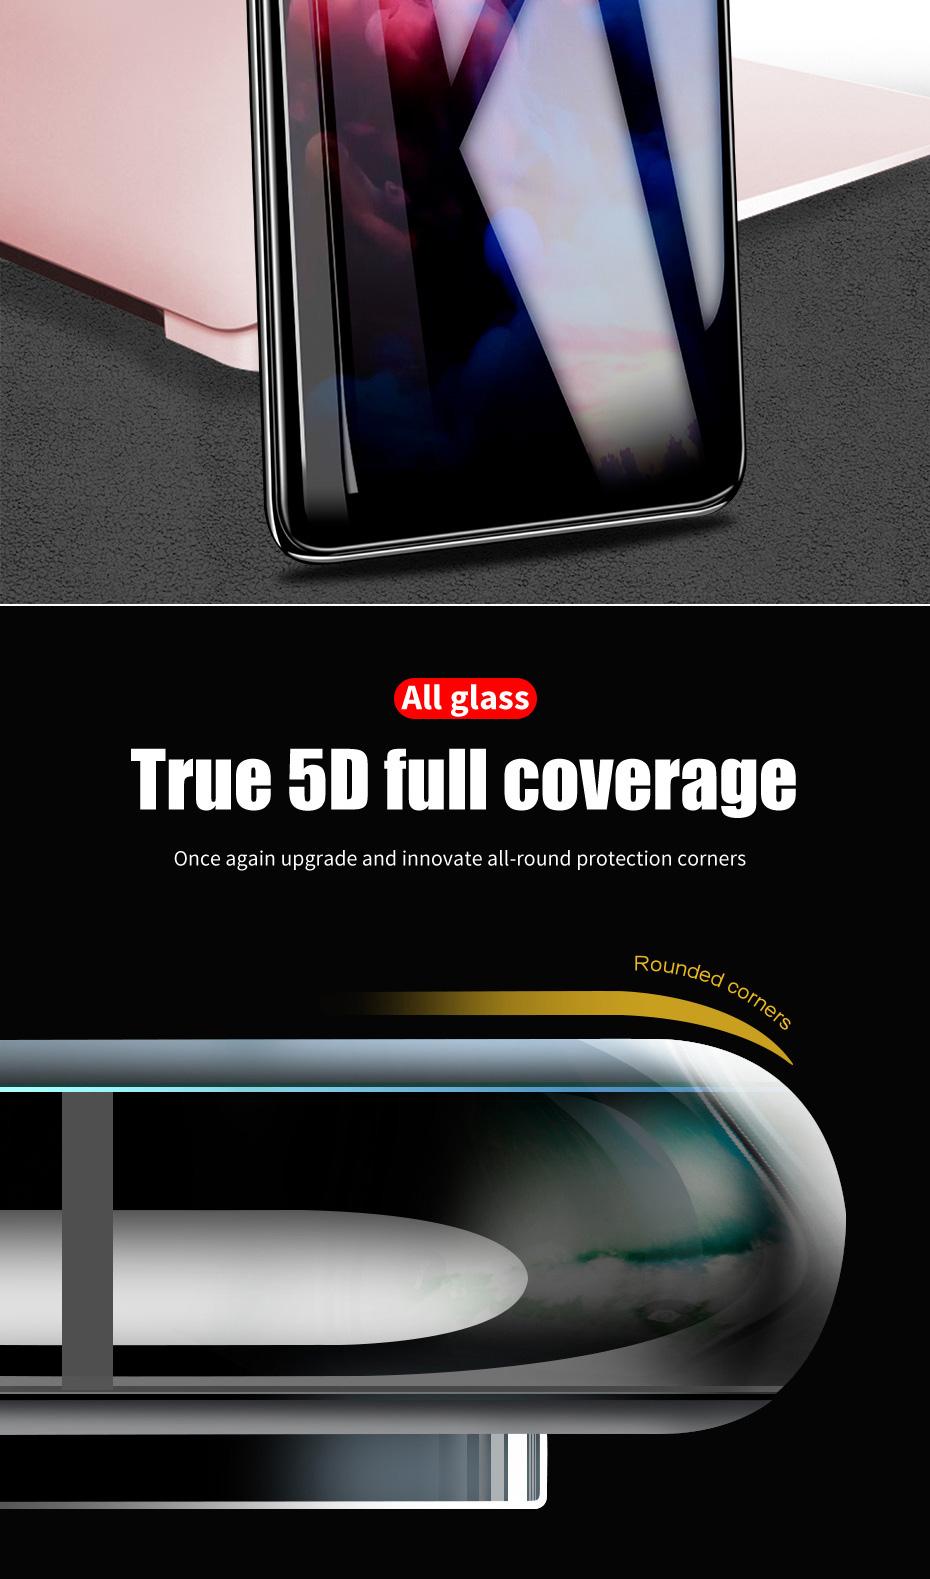 ZNP 5D Screen Protector Tempered Glass For Xiaomi Redmi Note 7 5 Pro Redmi 4X 7A 7 6 Protective Glass For Redmi 5 Plus k20 Film 4